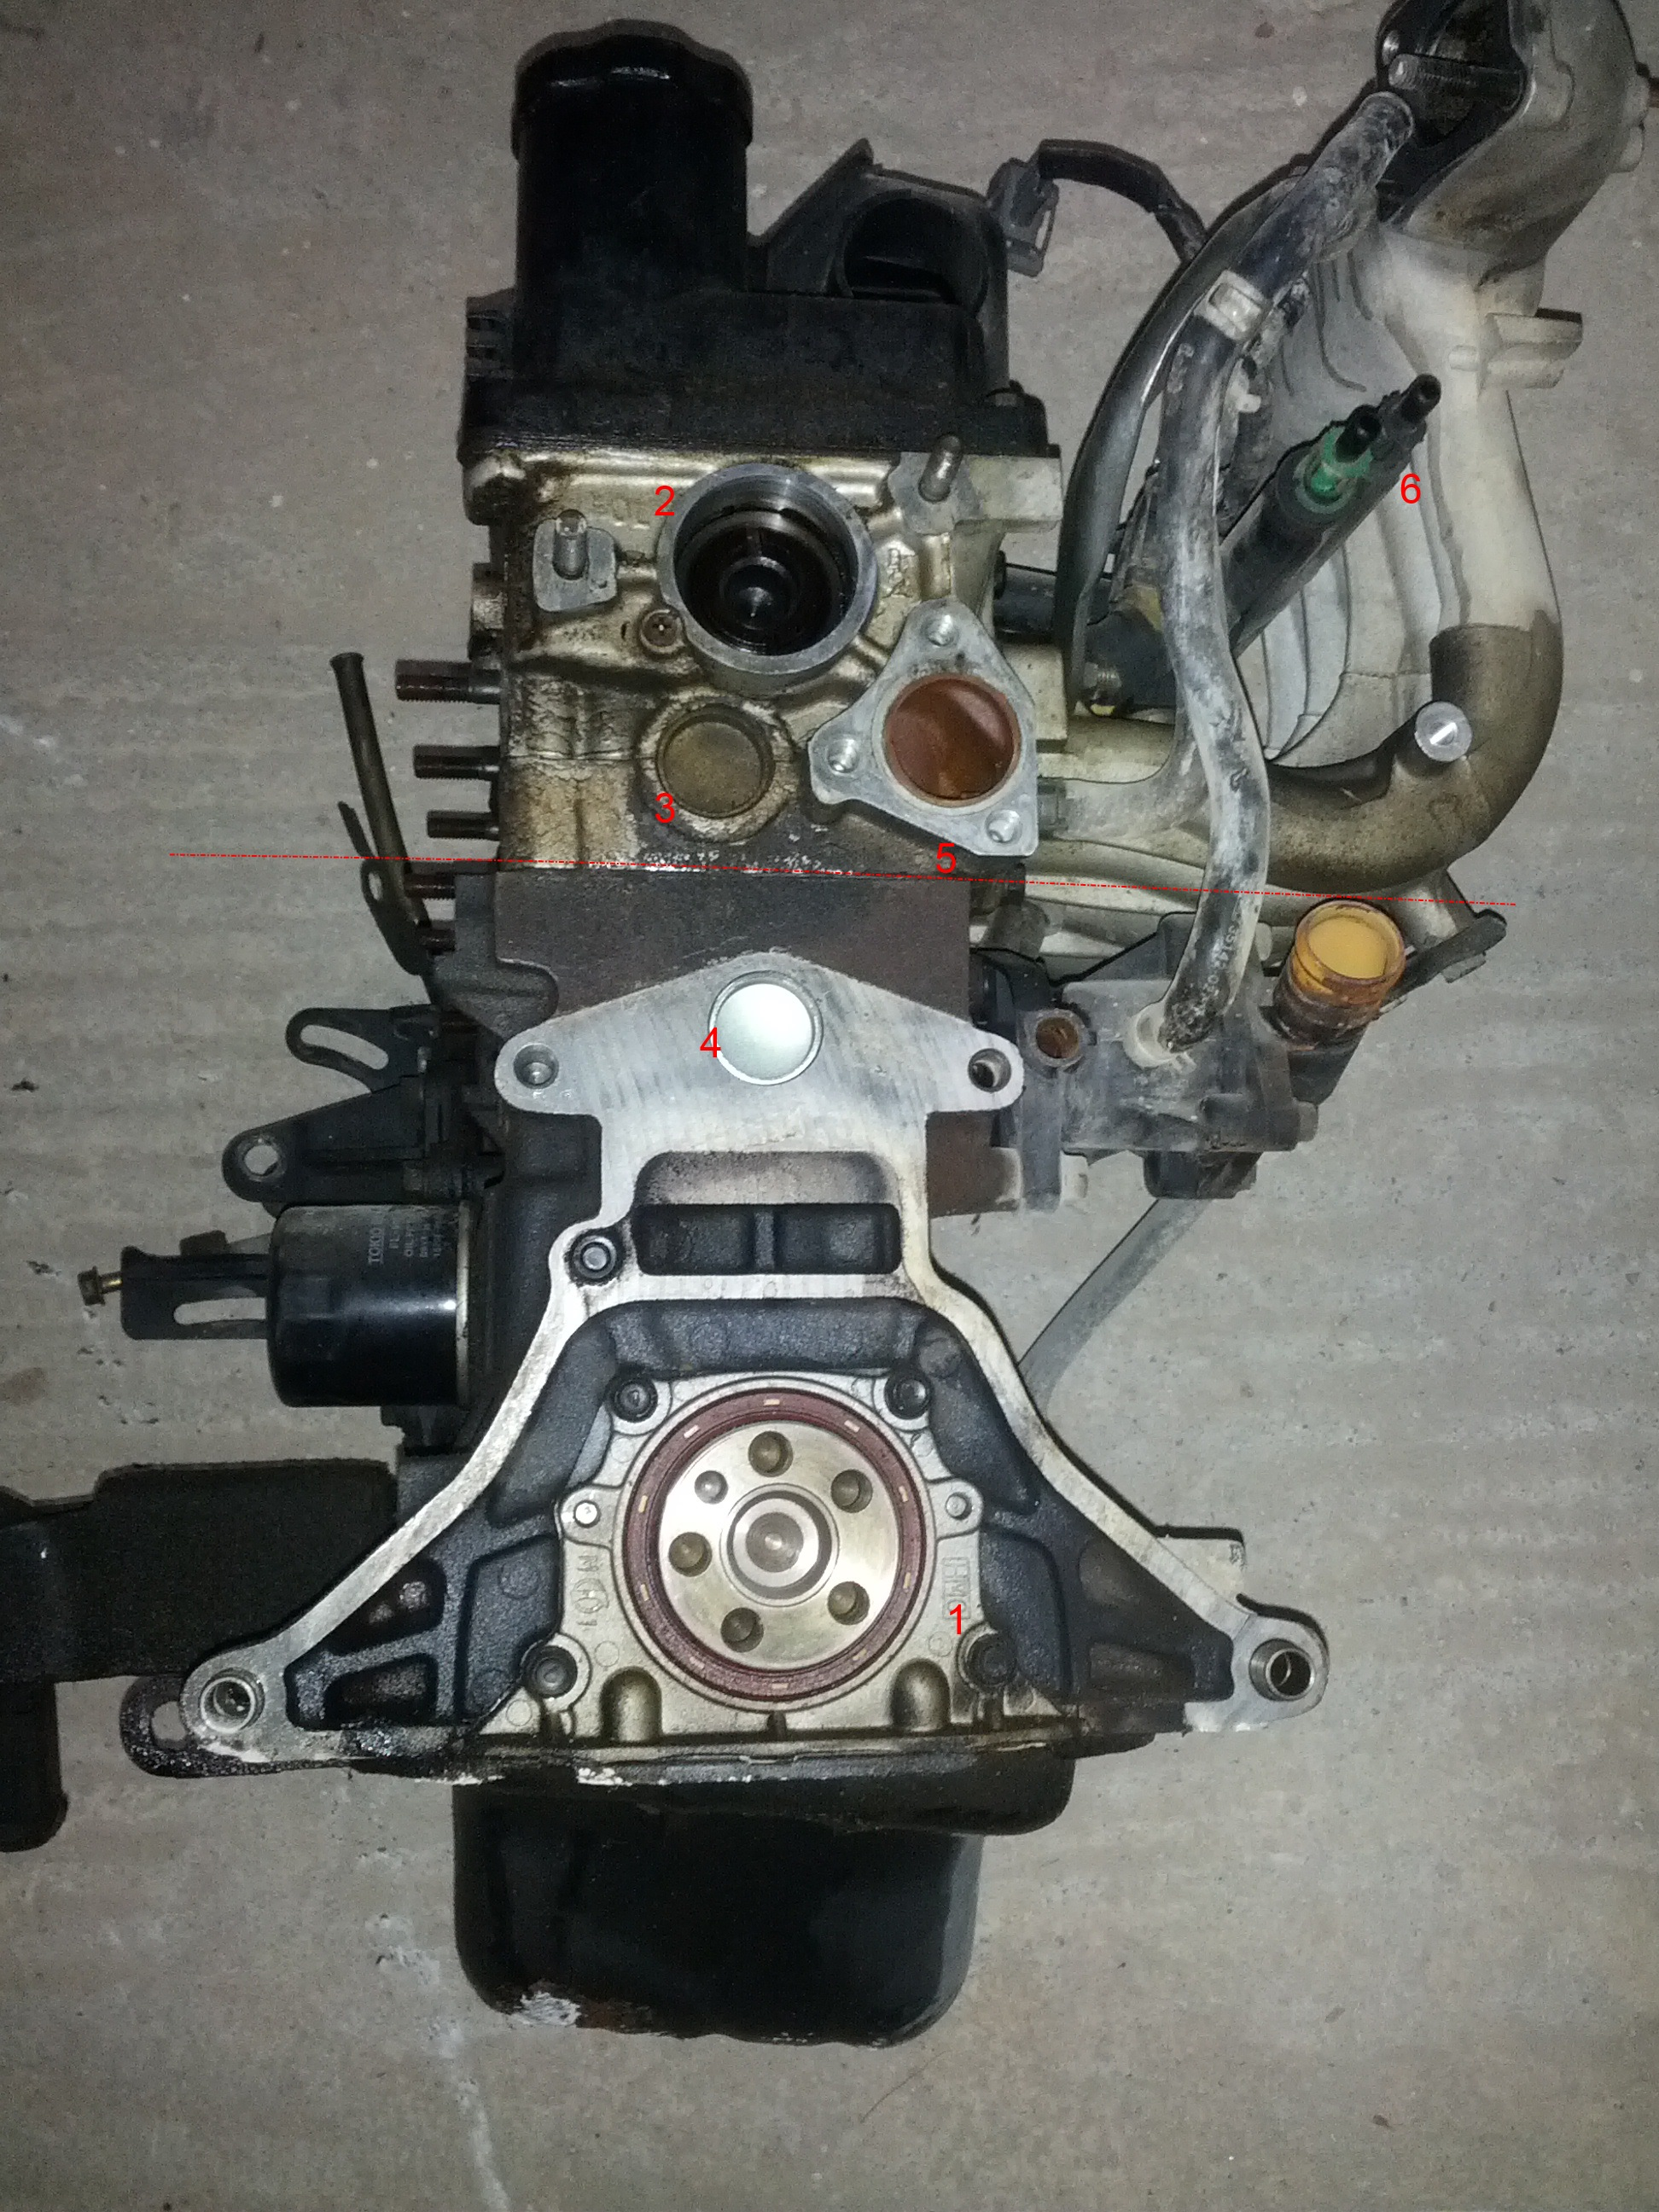 Hyundai Atos Engine Teardown Part 1 Diagram Intake Area Right 2